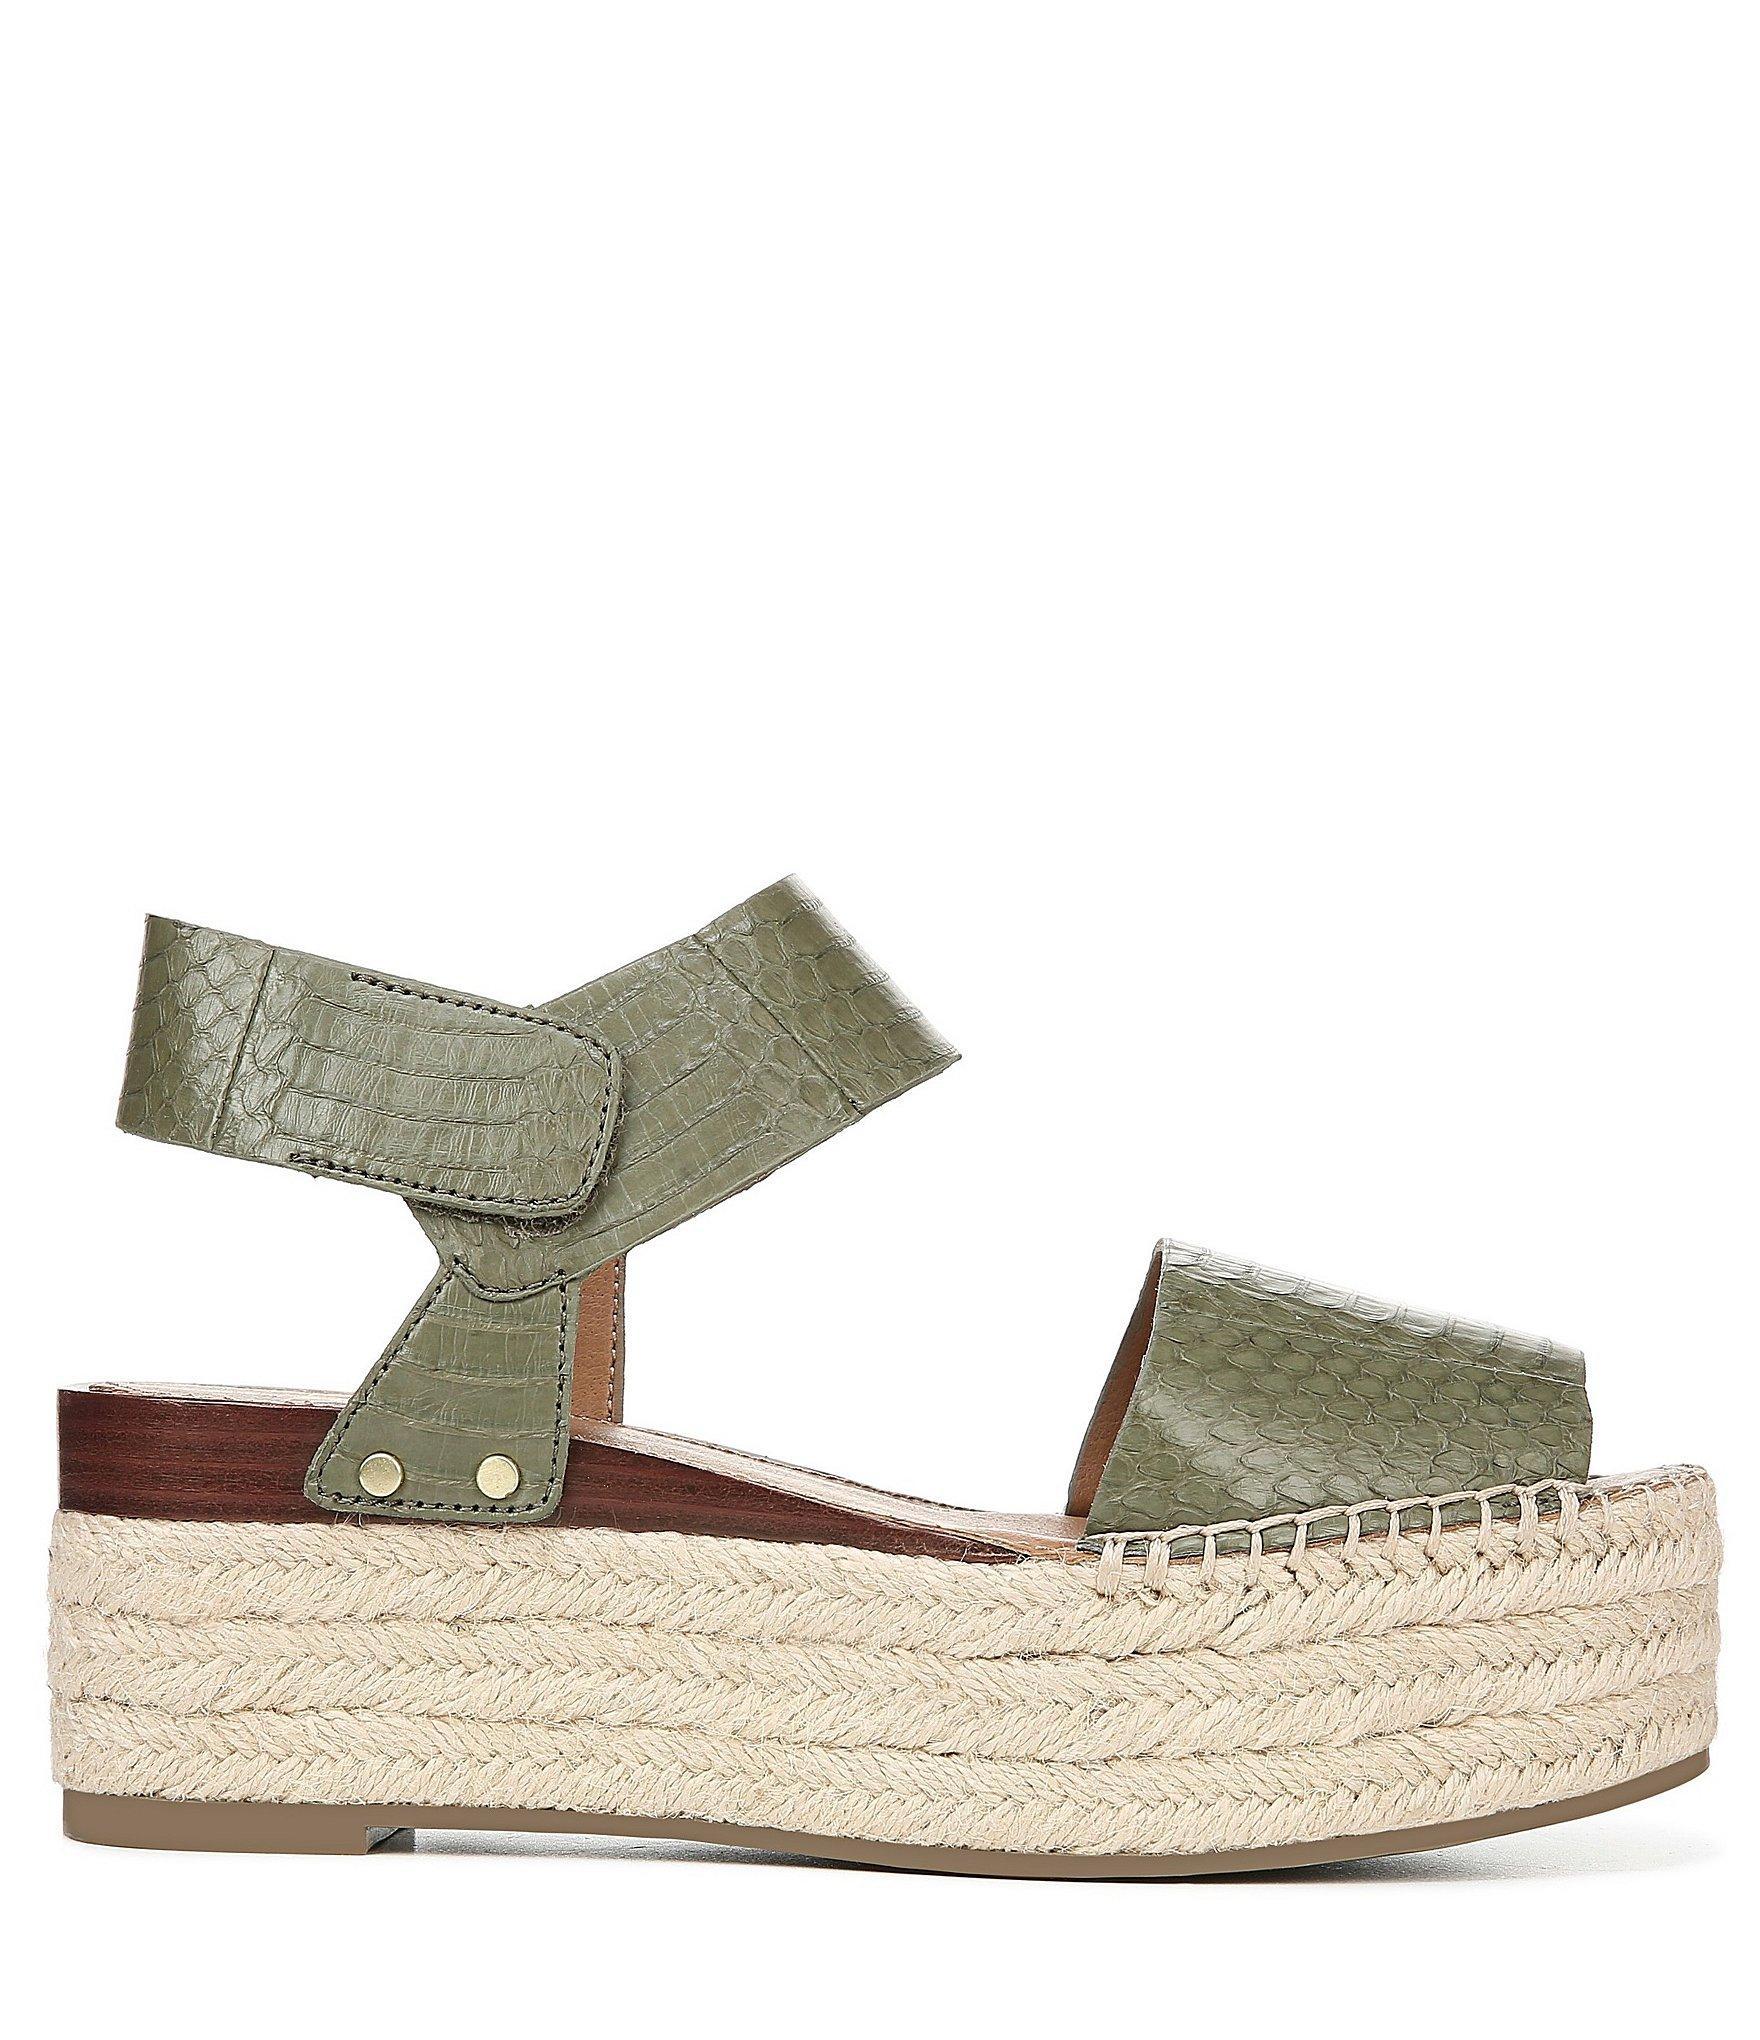 b4768504a3 Franco Sarto - Green Sarto By Leo2 Espadrille Snake Print Leather Flatform  Sandals - Lyst. View fullscreen